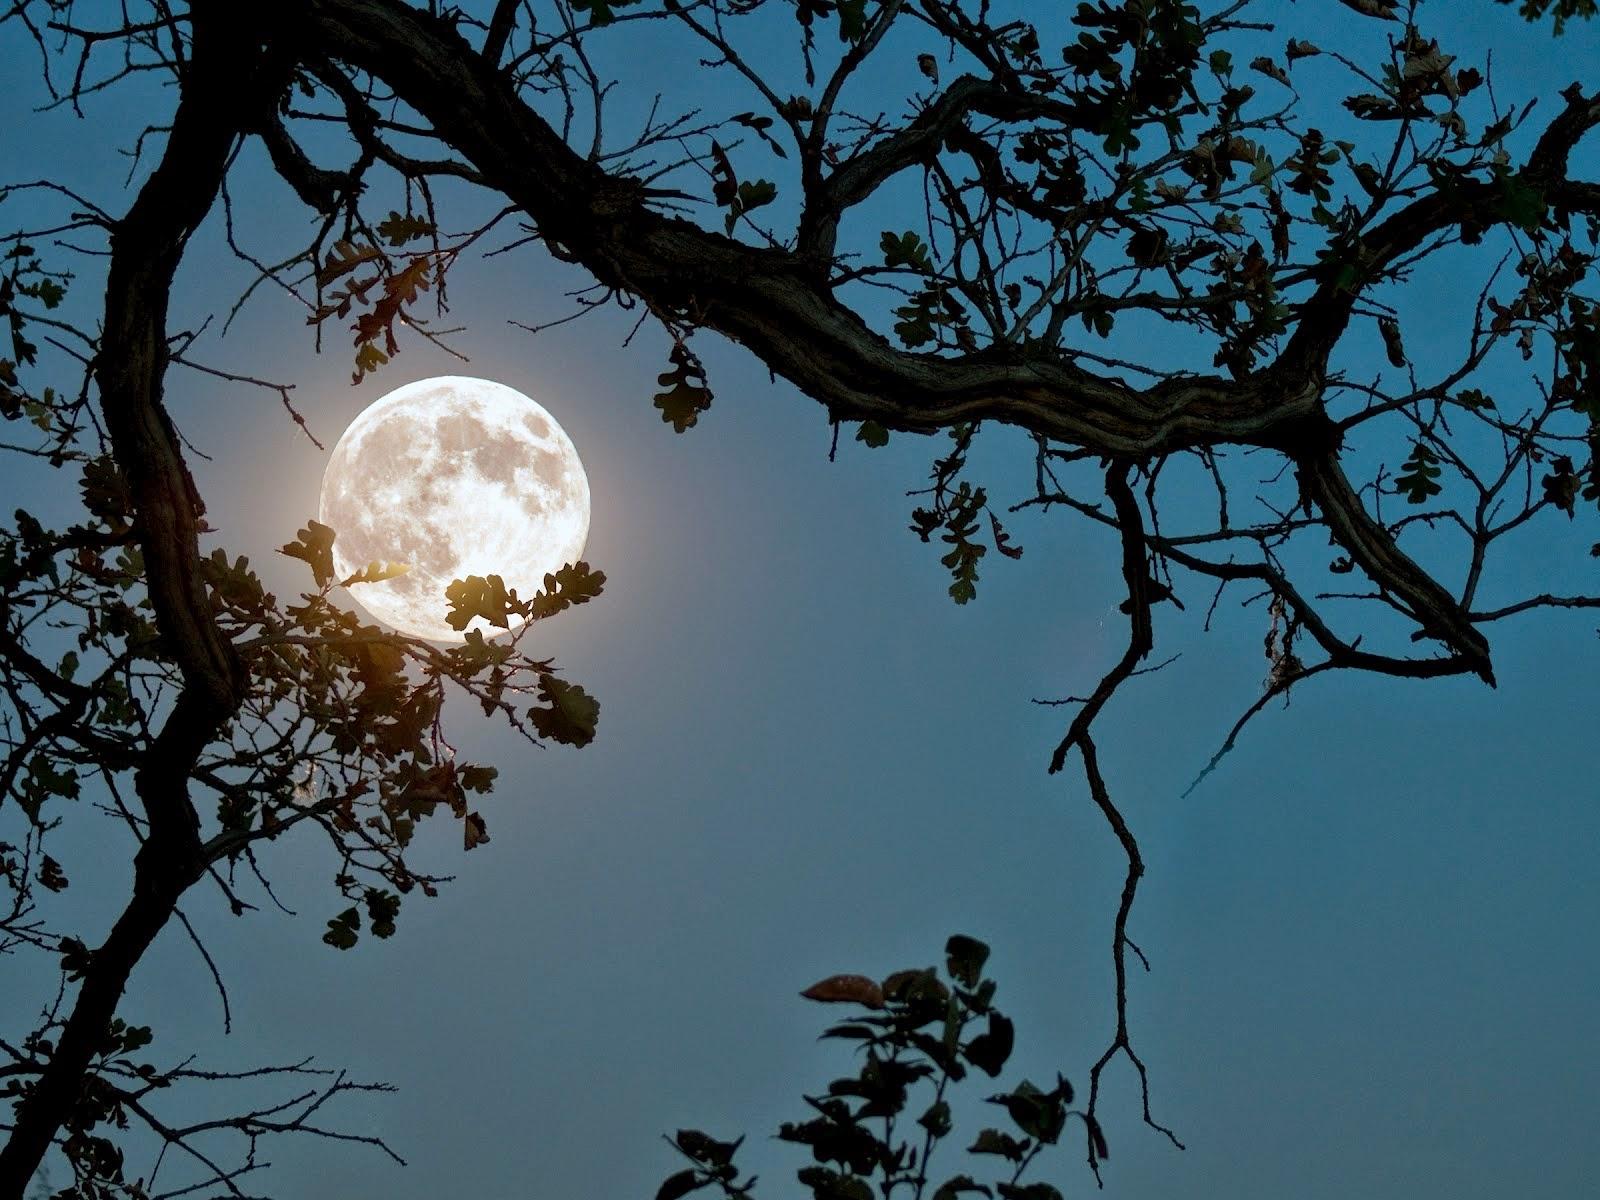 trees night moon blotch - photo #36